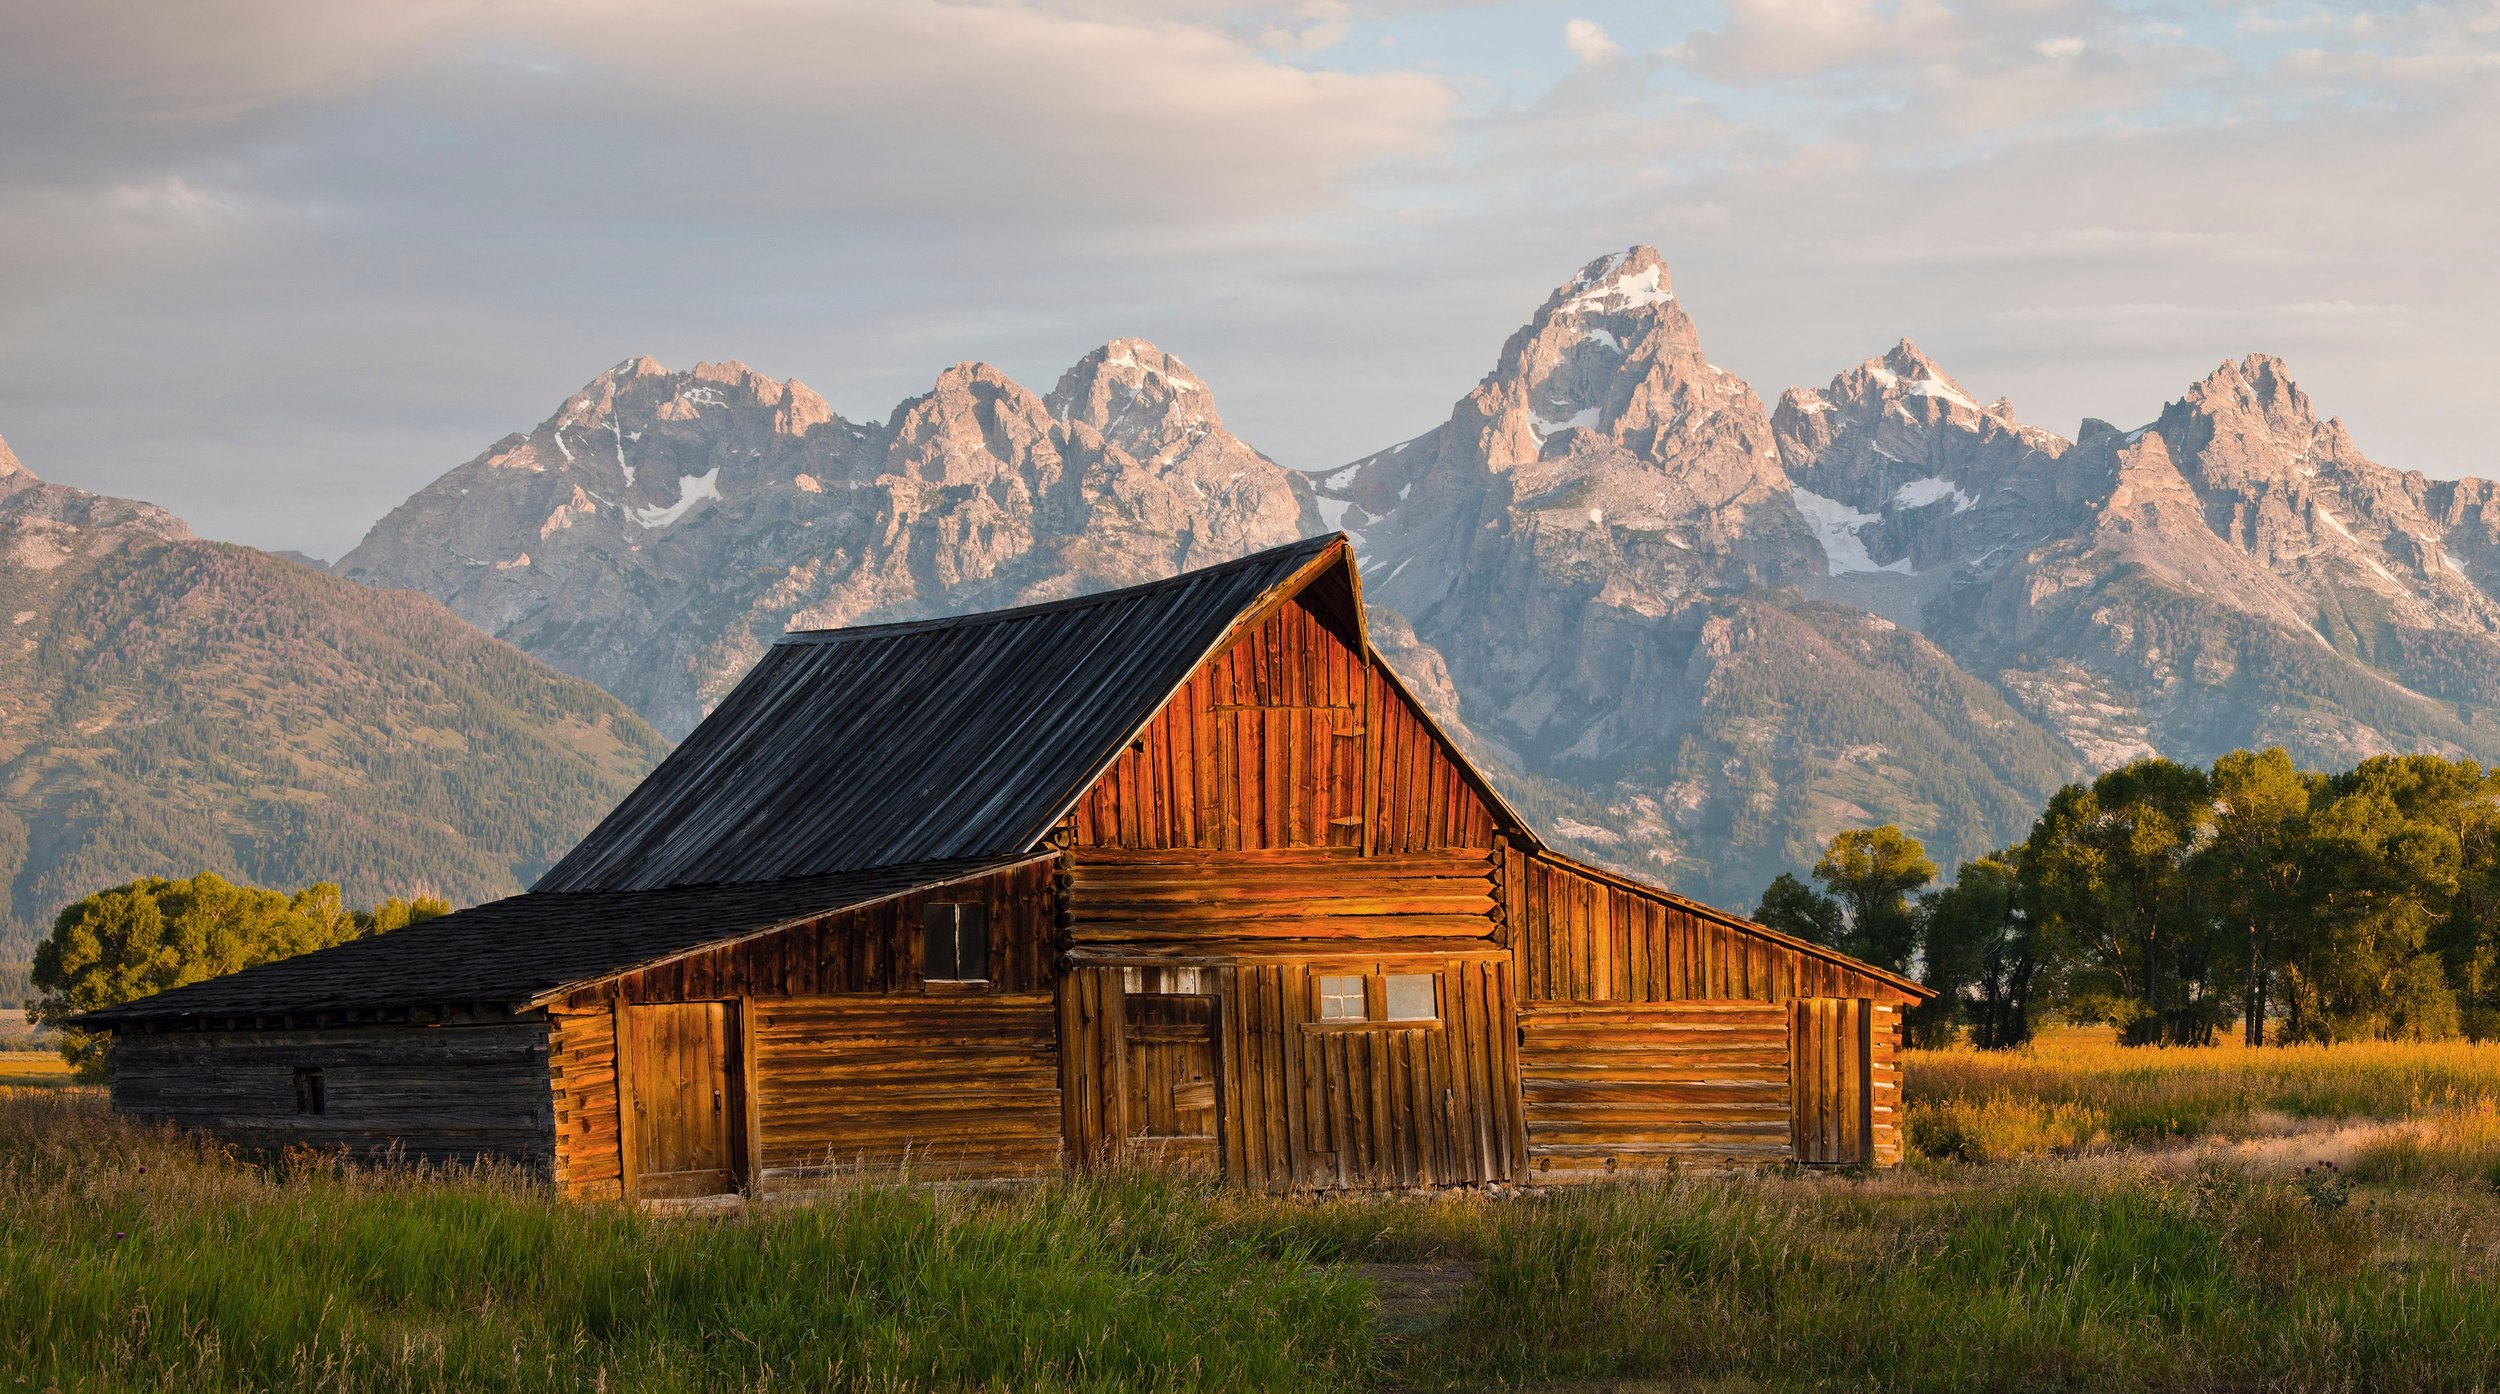 teton-mountains-wyoming.jpg